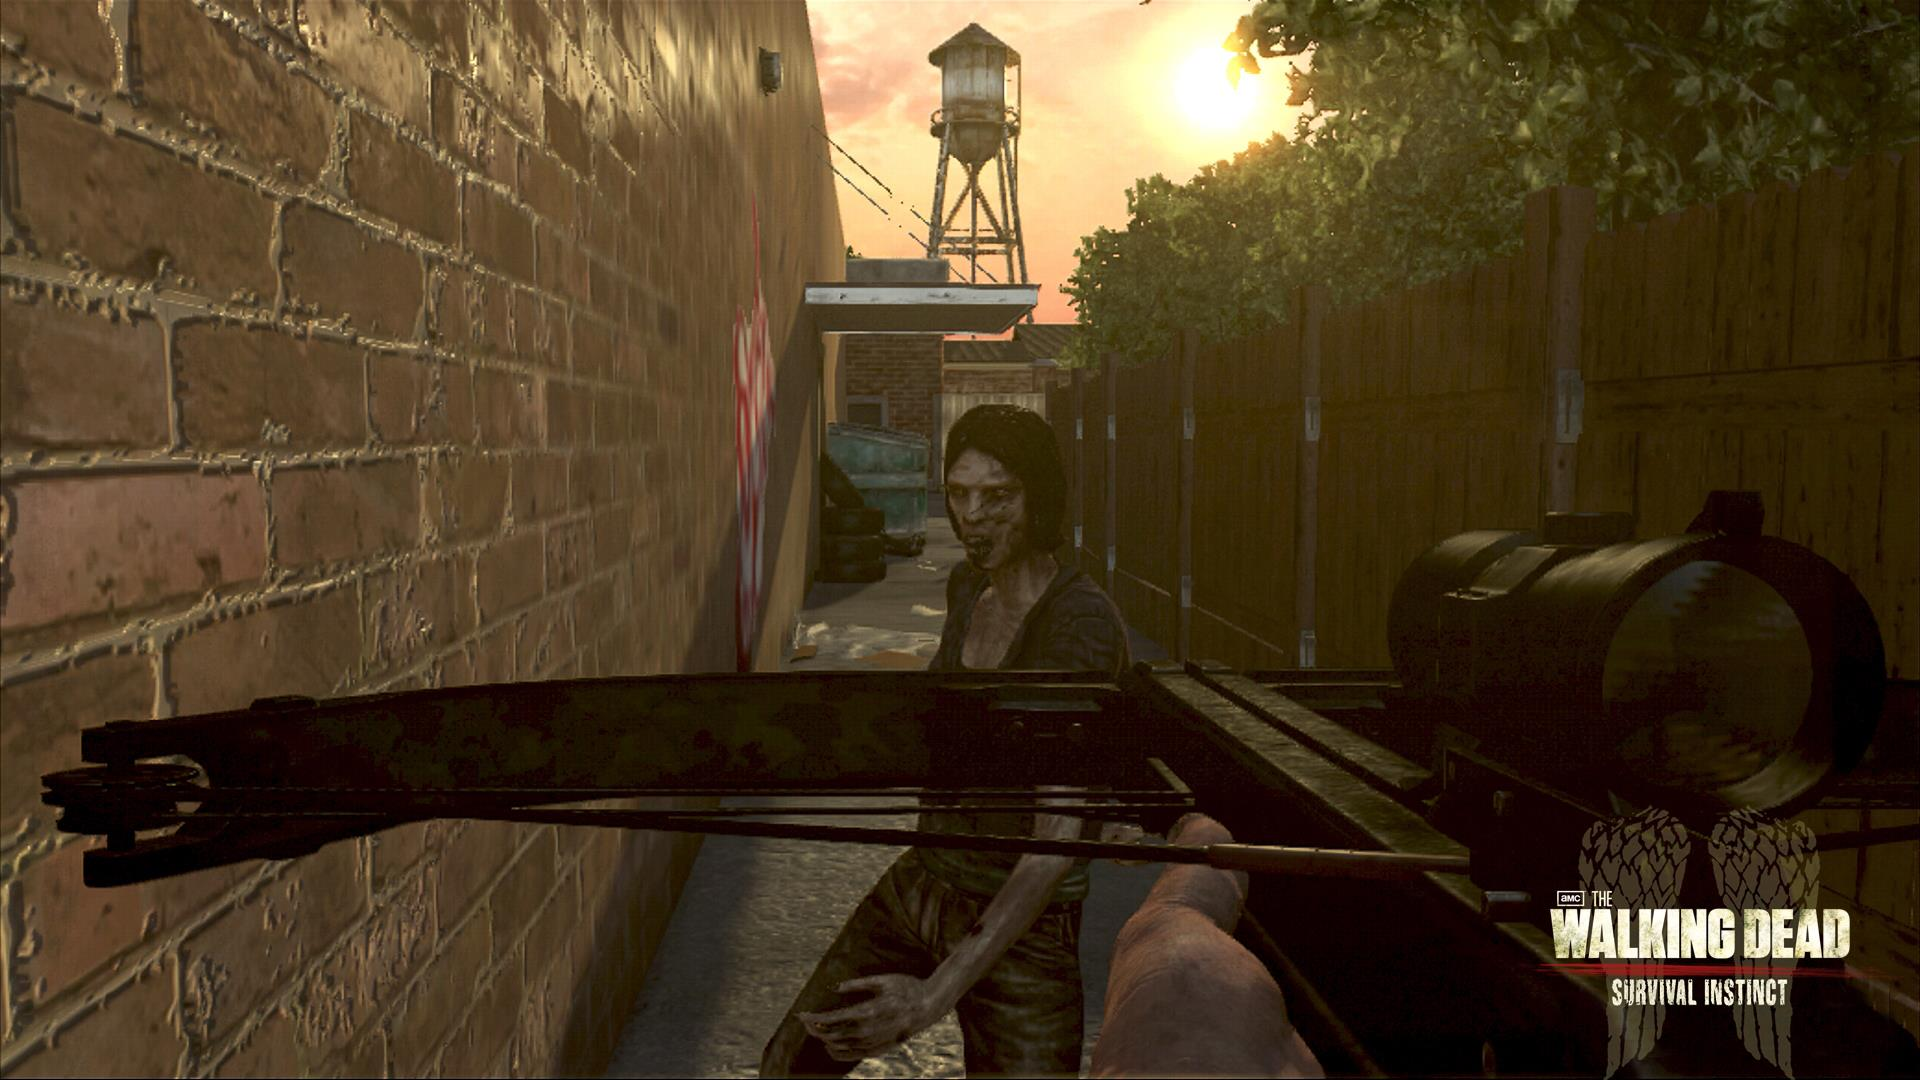 The Walking Dead Survival Instinct Xbox 360 Identi